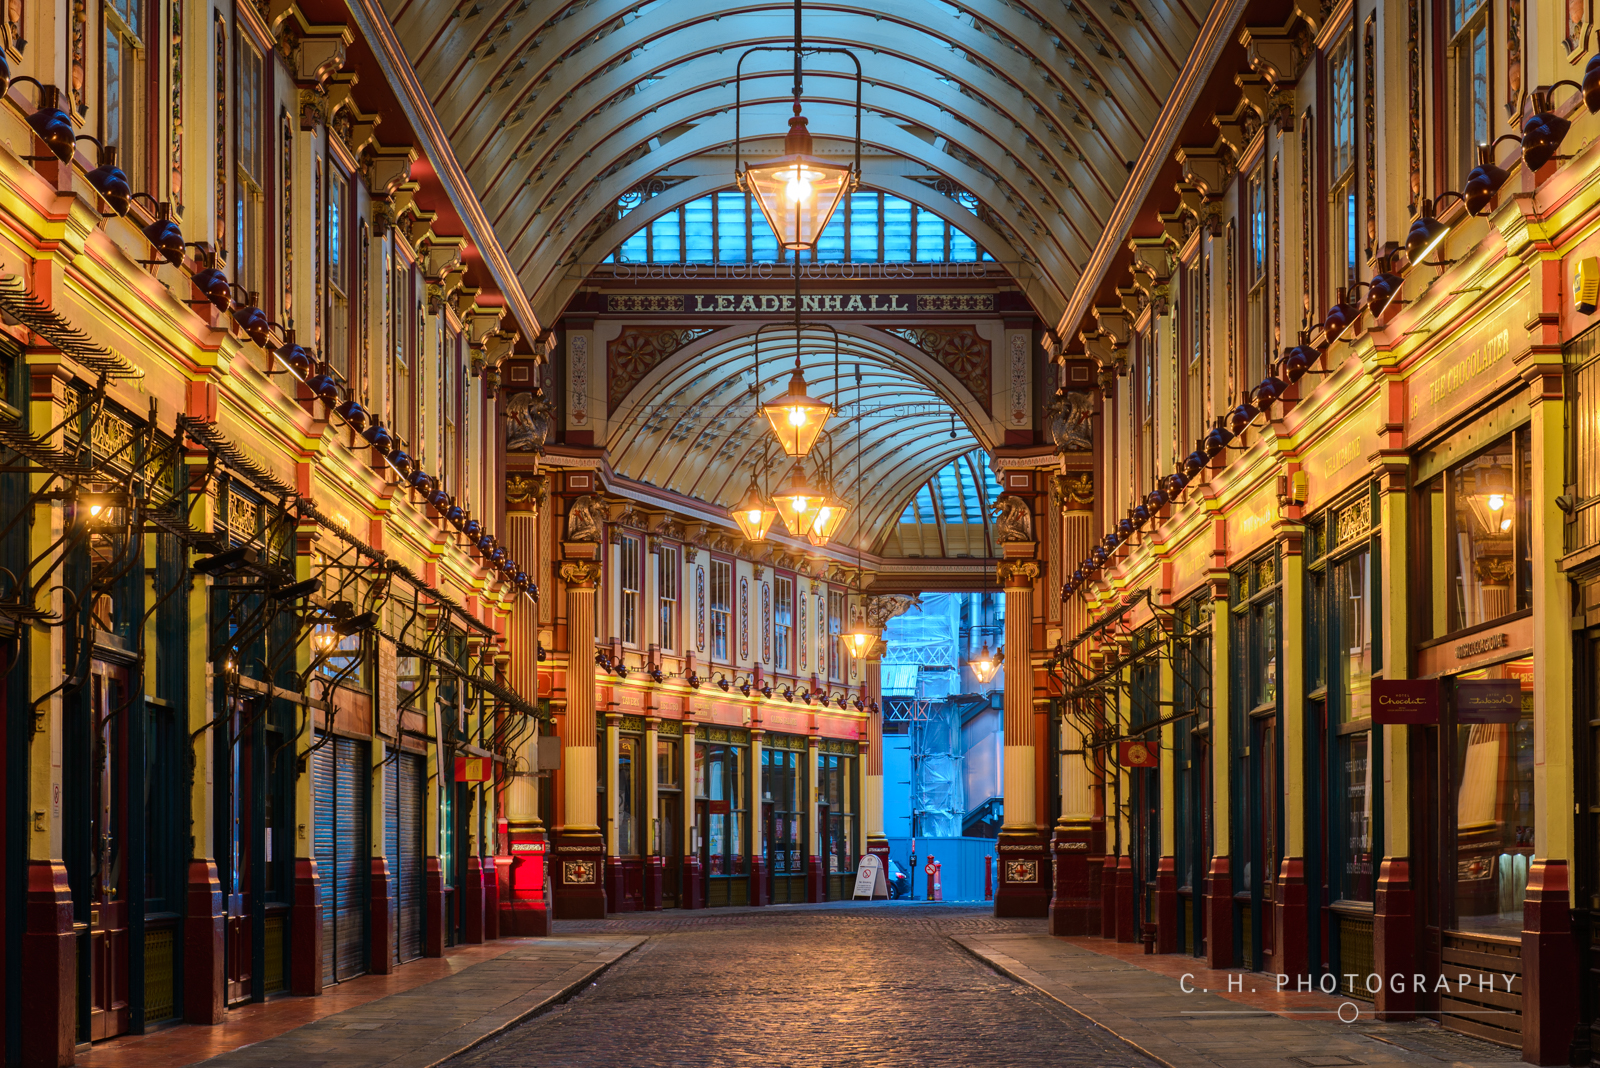 London - U.K.